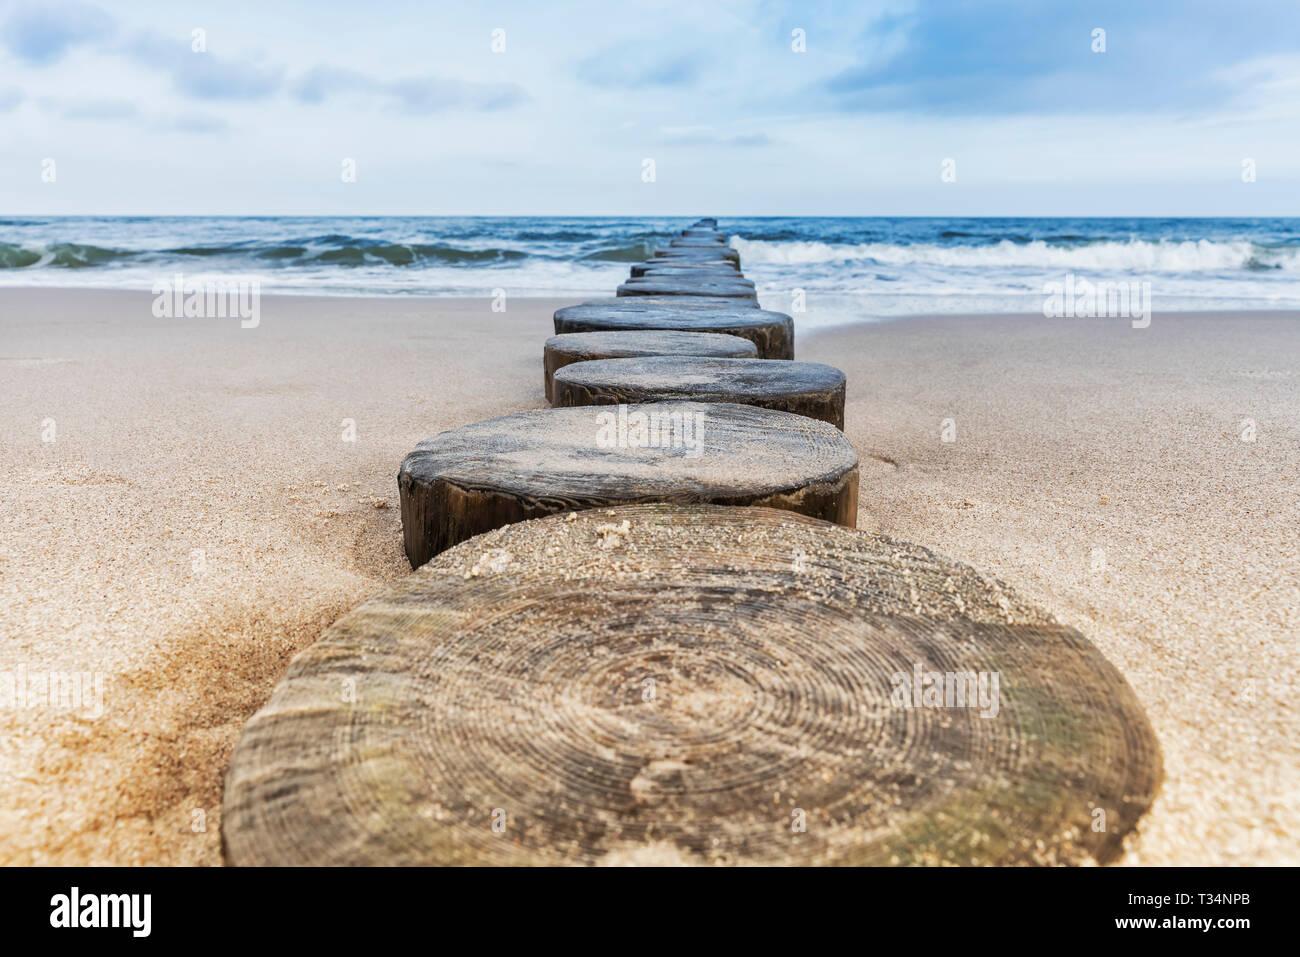 Groynes at the beach of the Baltic Sea in Kolobrzeg, West Pomeranian, Poland, Europe Stock Photo